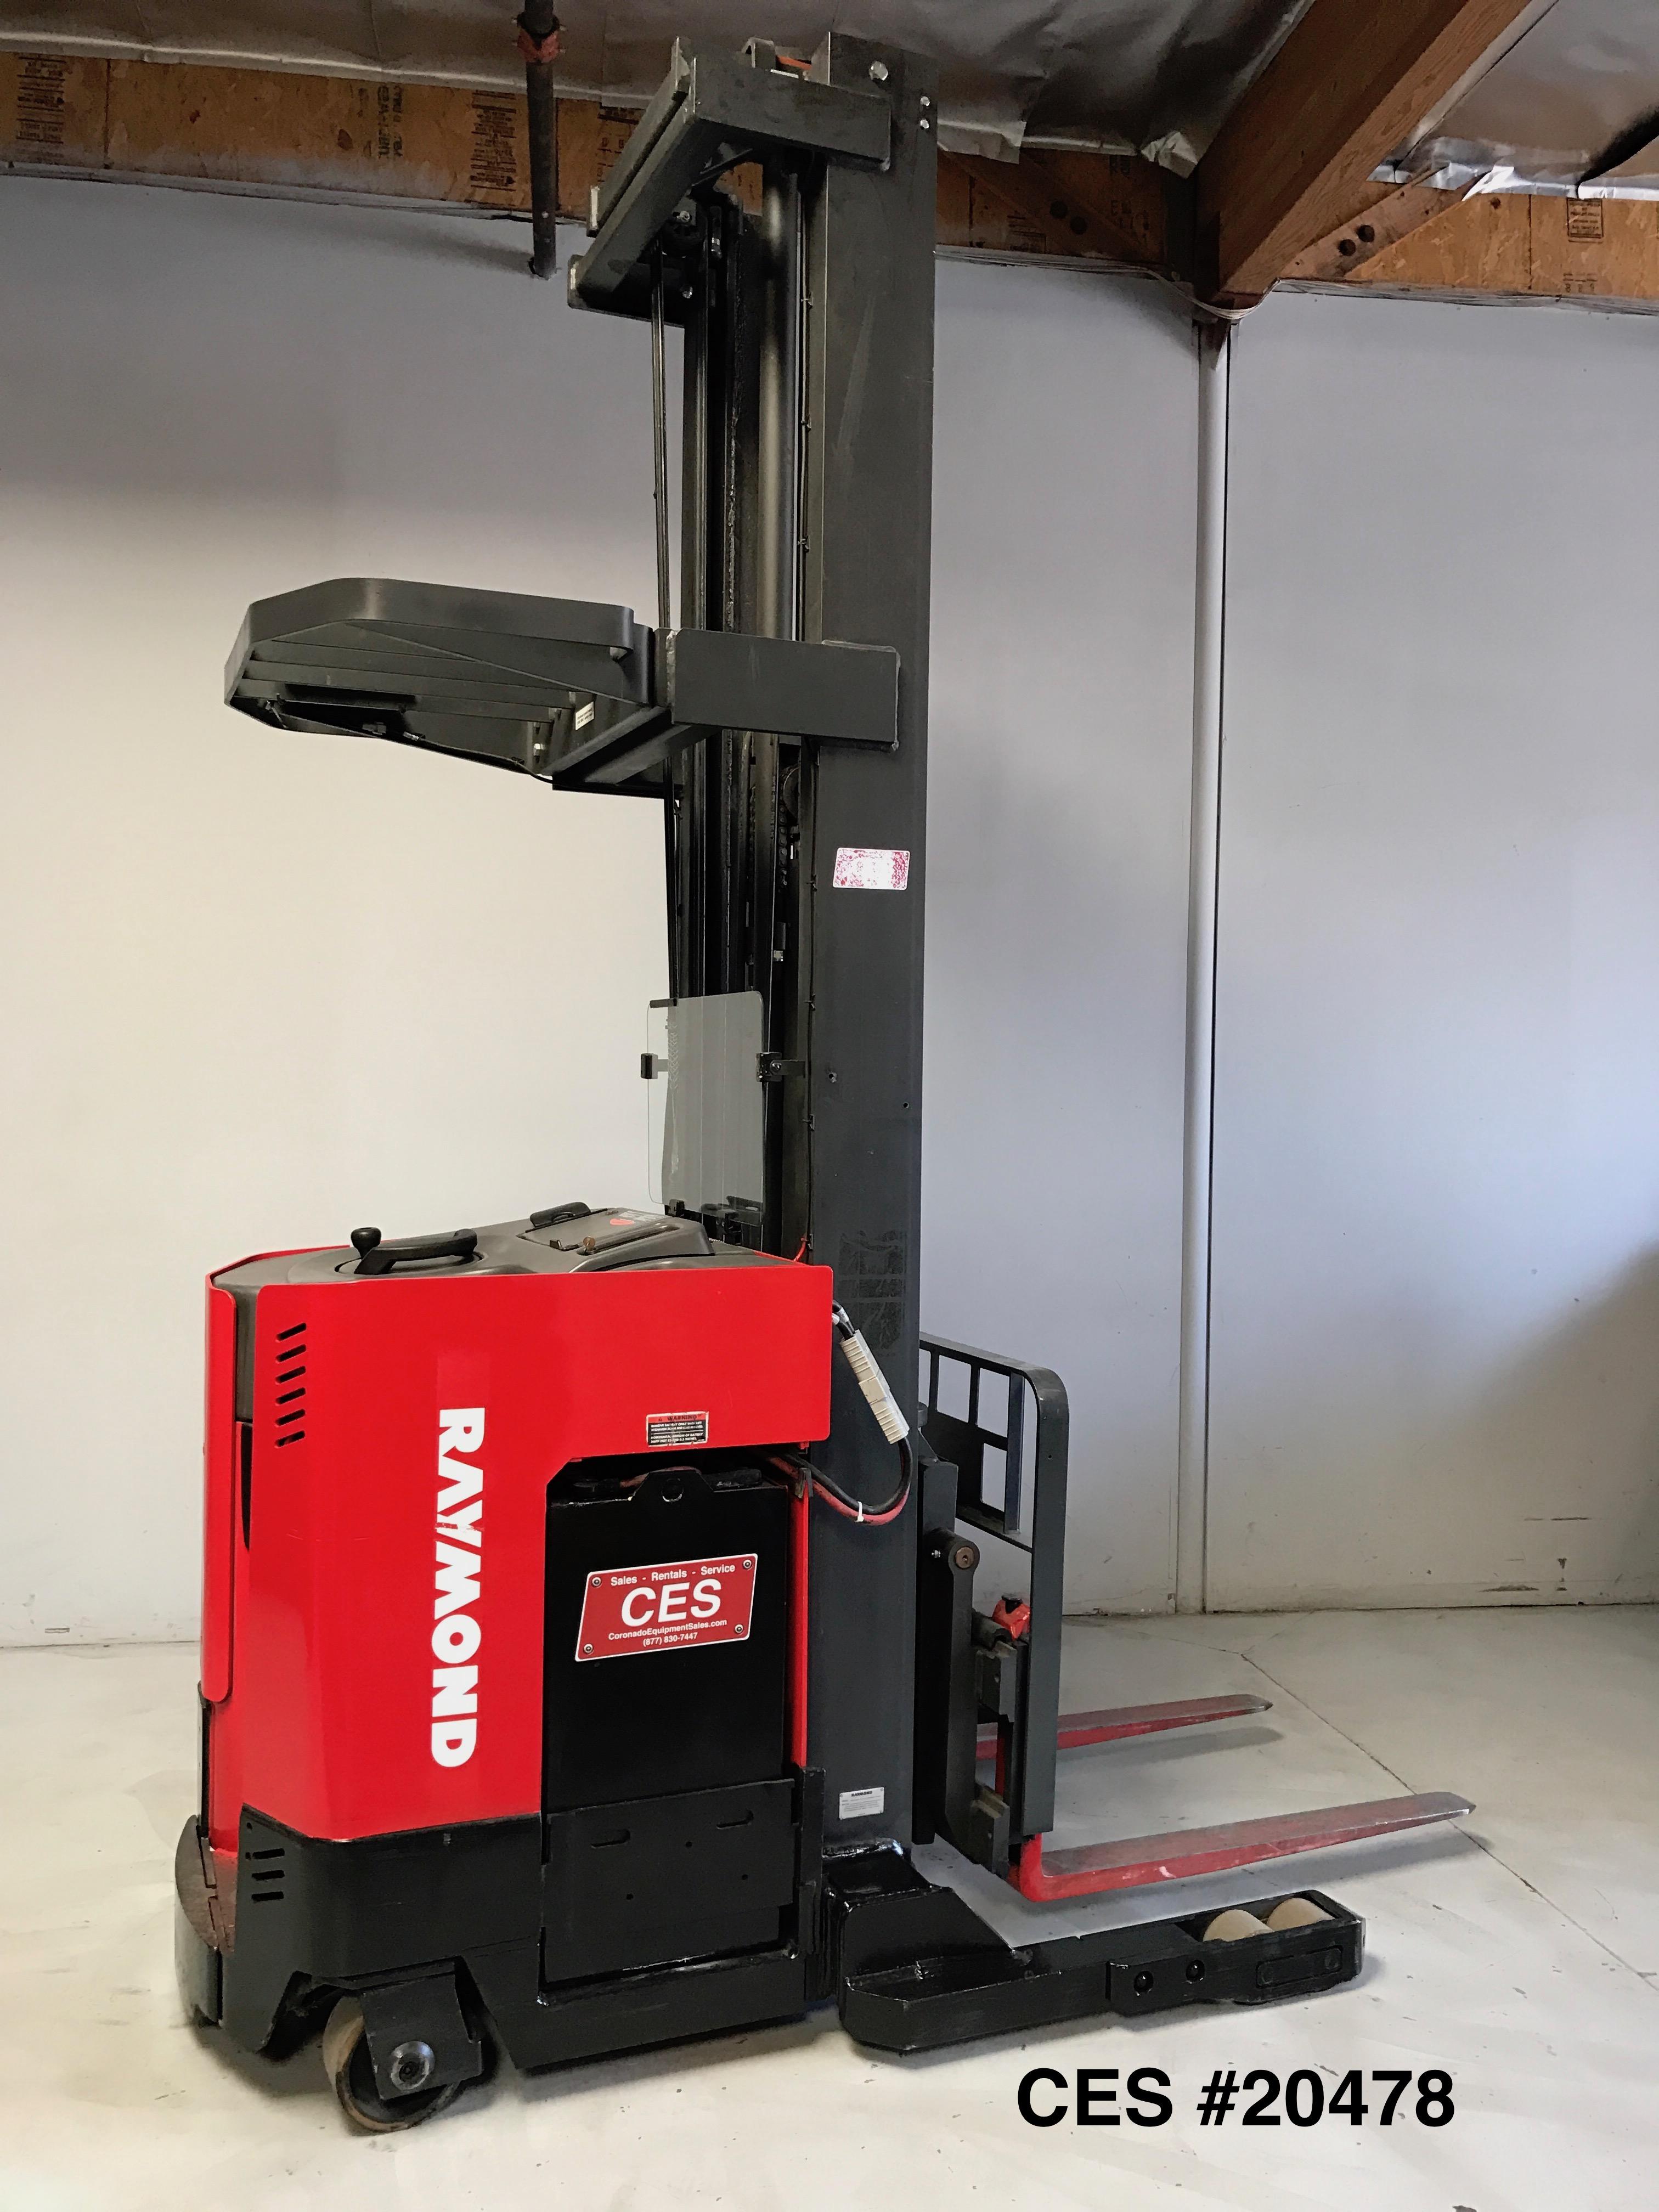 Ces 20478 raymond easi r40tt reach forklift 301 for Electric forklift motor for sale